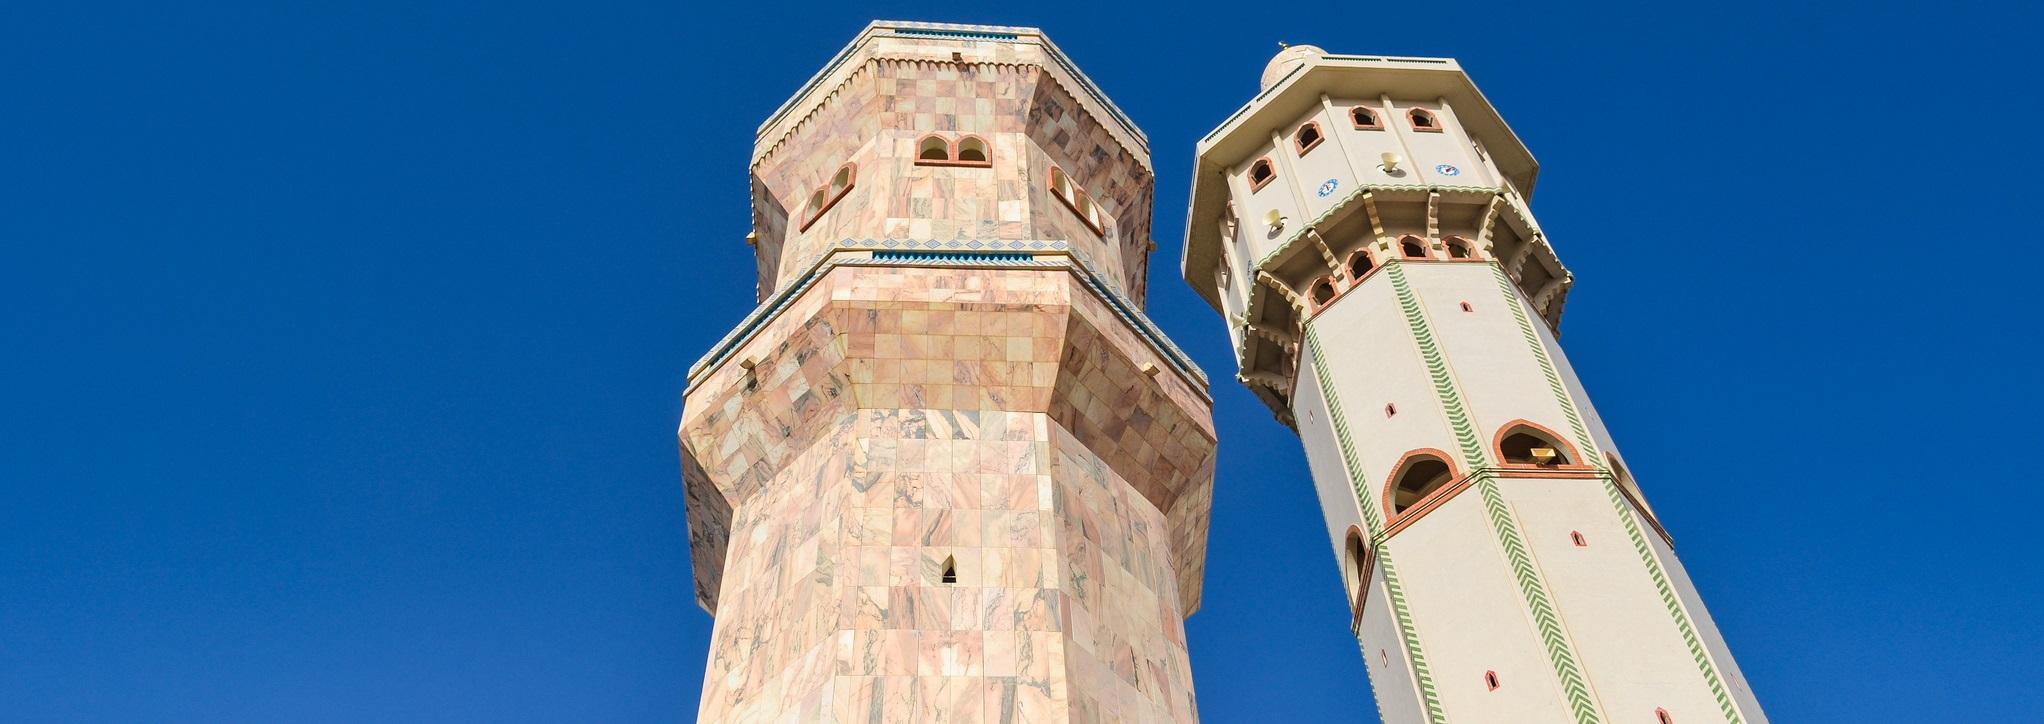 jbdodane, Lamp Fall and mosque of Touba, Senegal